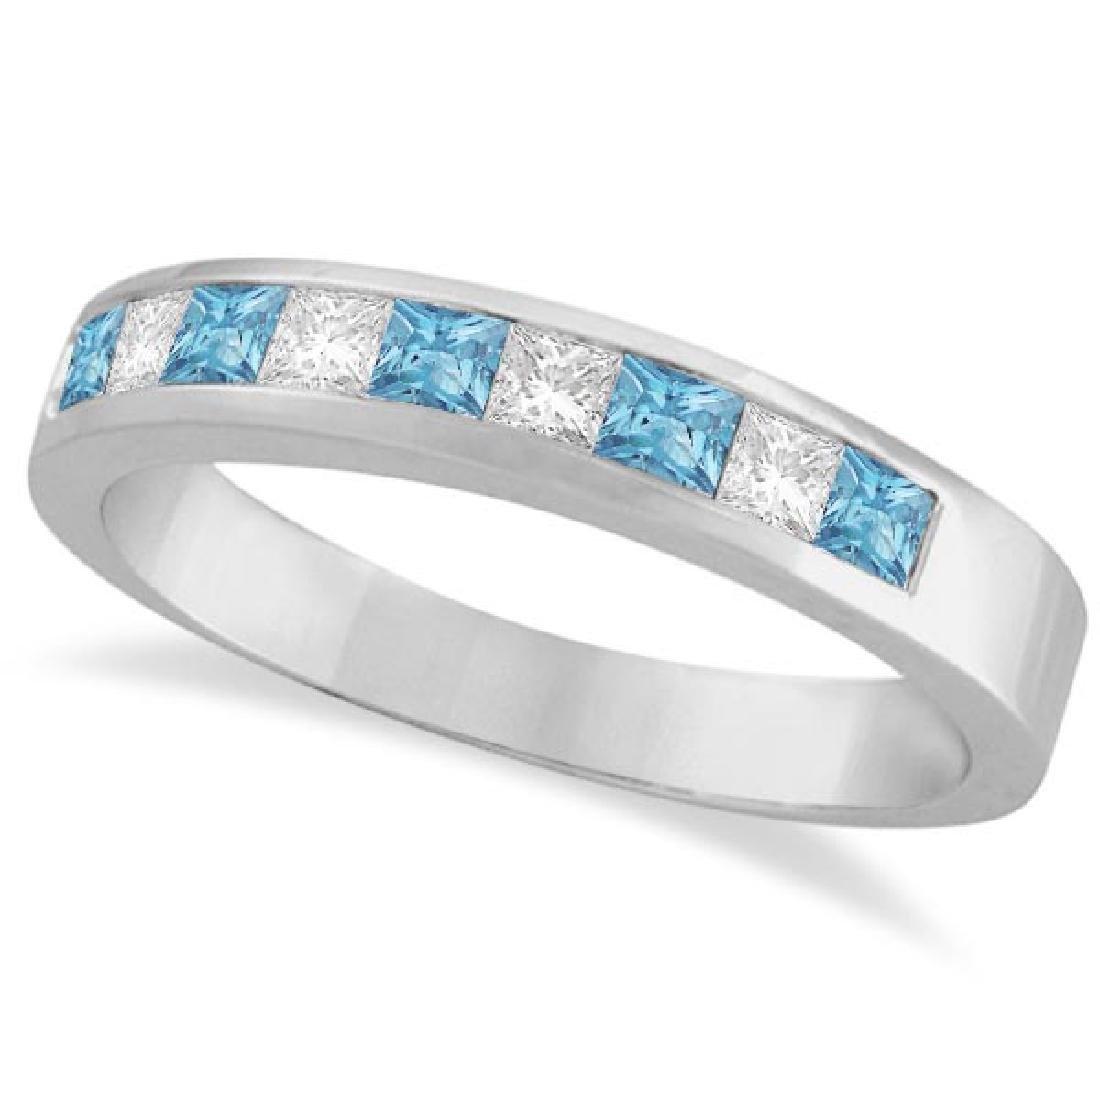 Princess Channel-Set Diamond and Aquamarine Ring Band 1